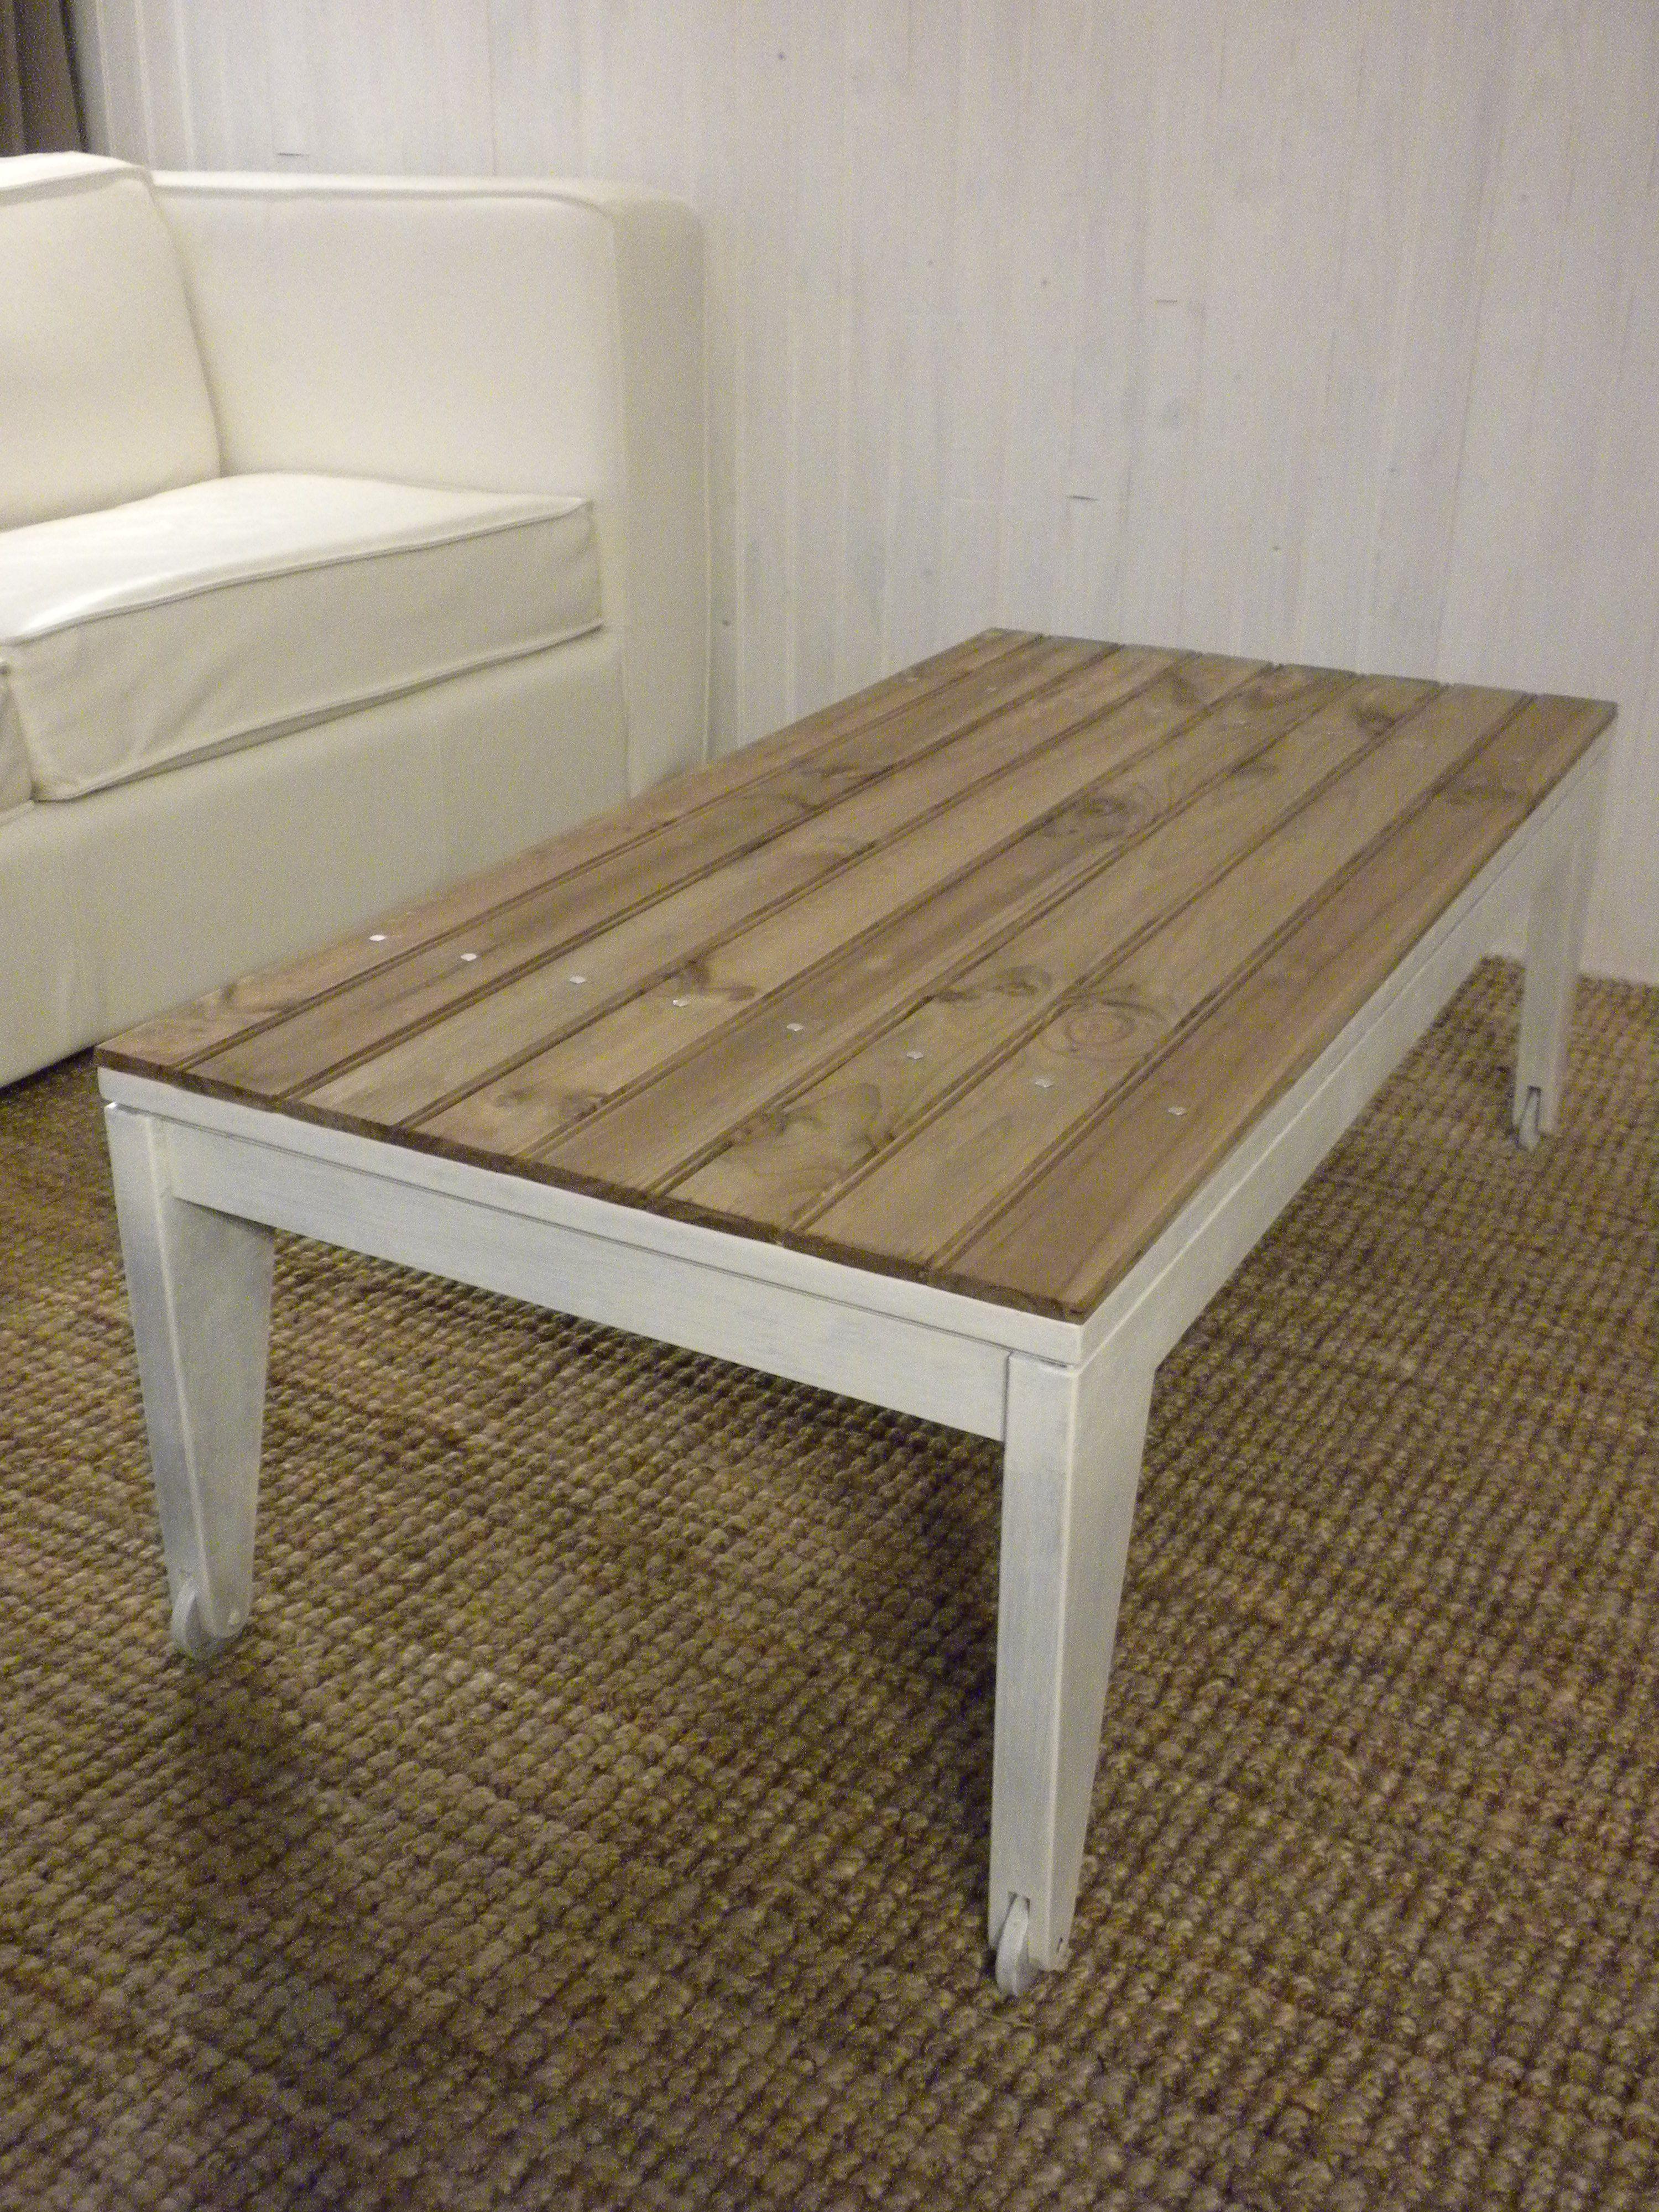 tuto relooking d une table basse decoration diy recup. Black Bedroom Furniture Sets. Home Design Ideas